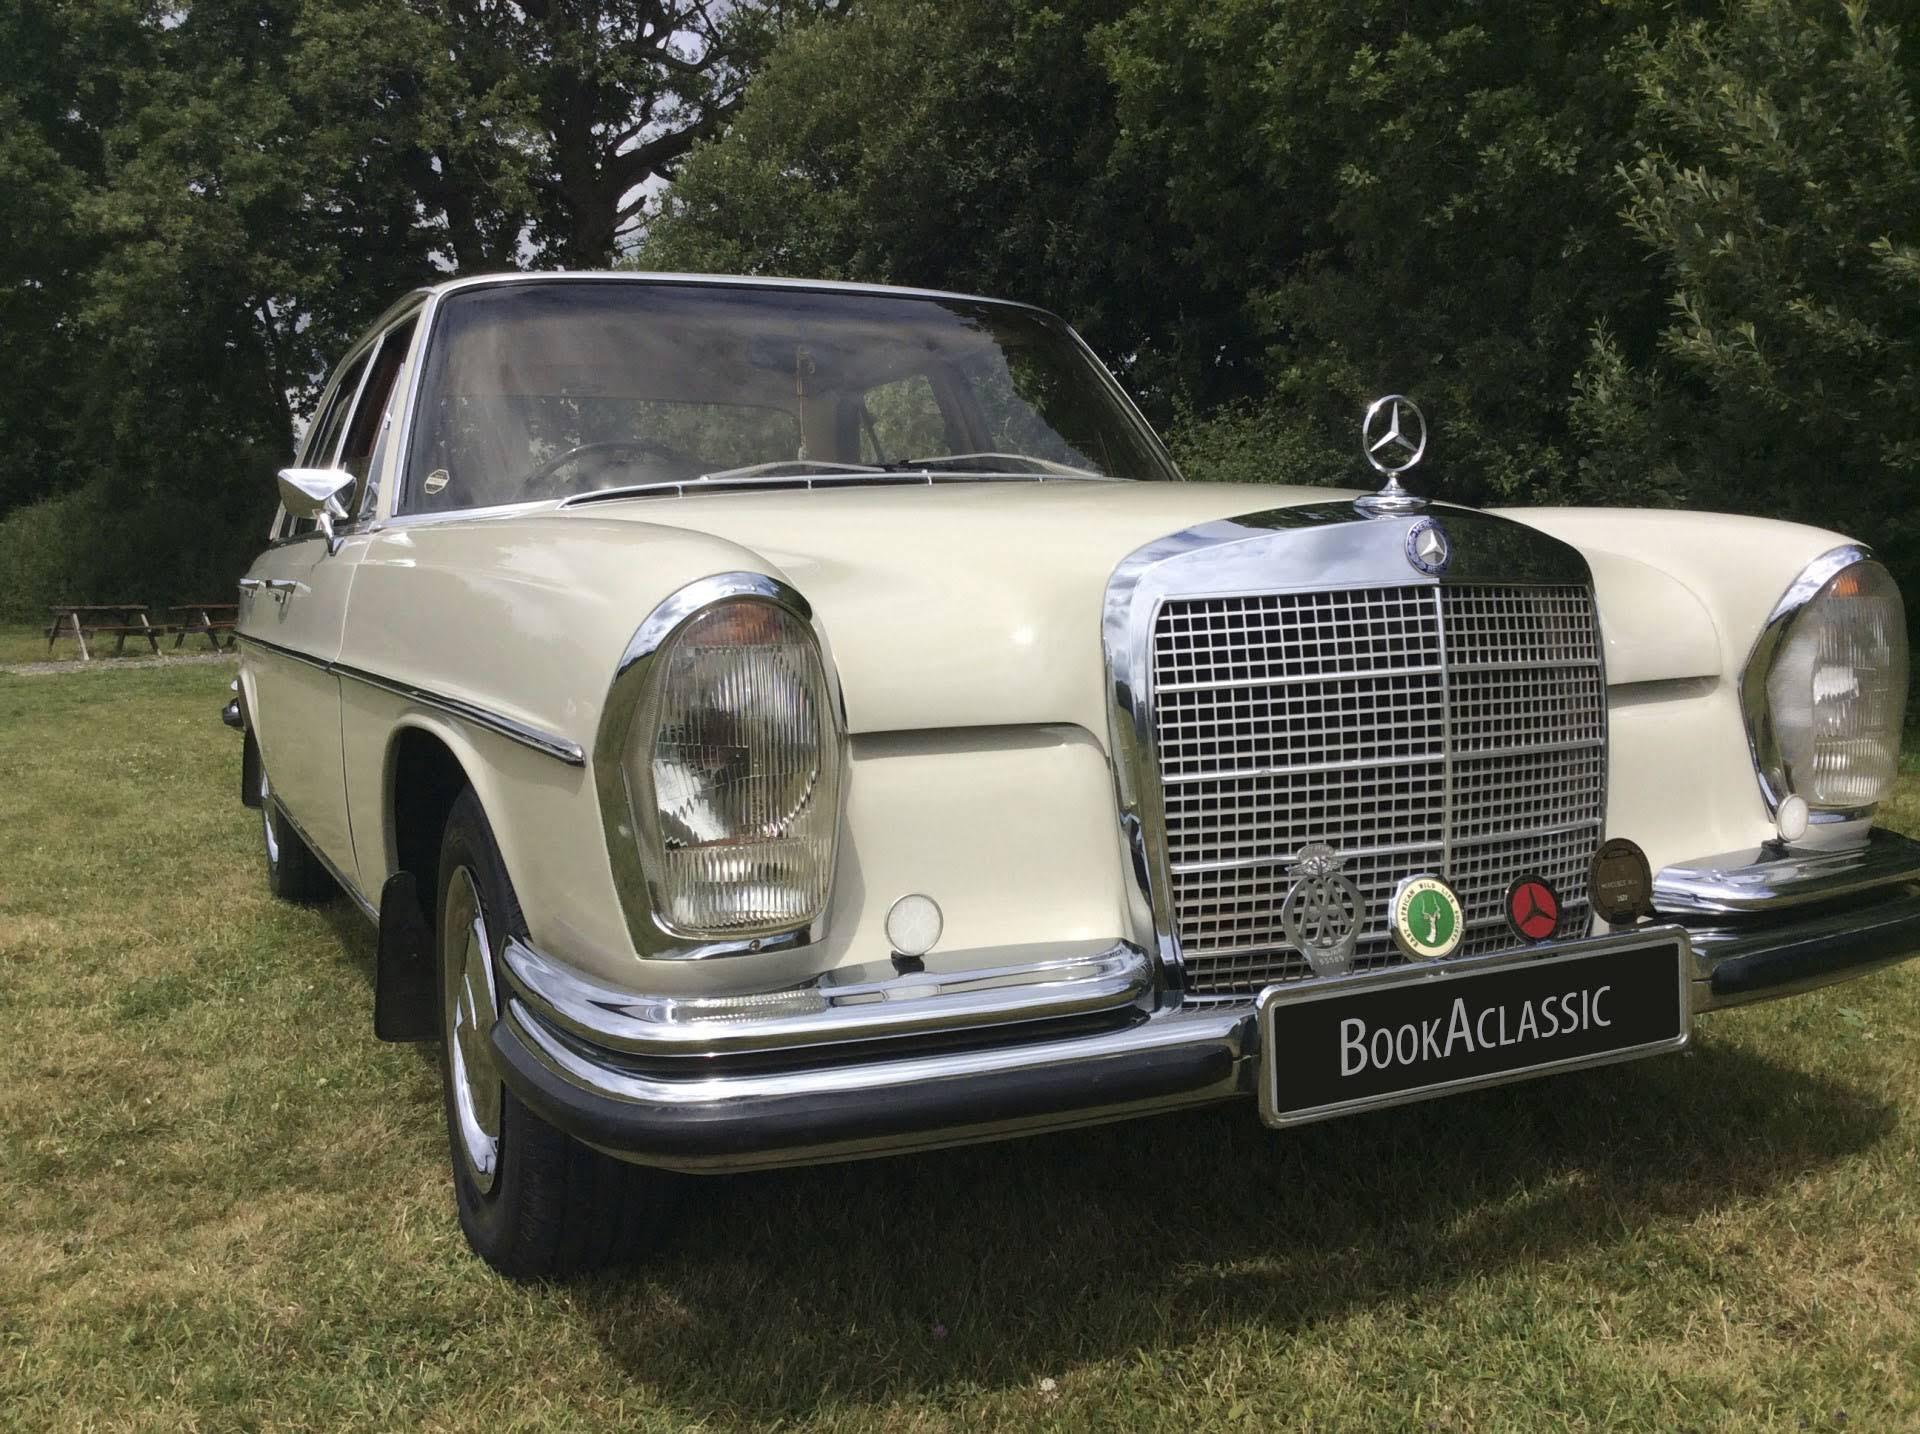 Vintage Wedding Cars - BookAclassic